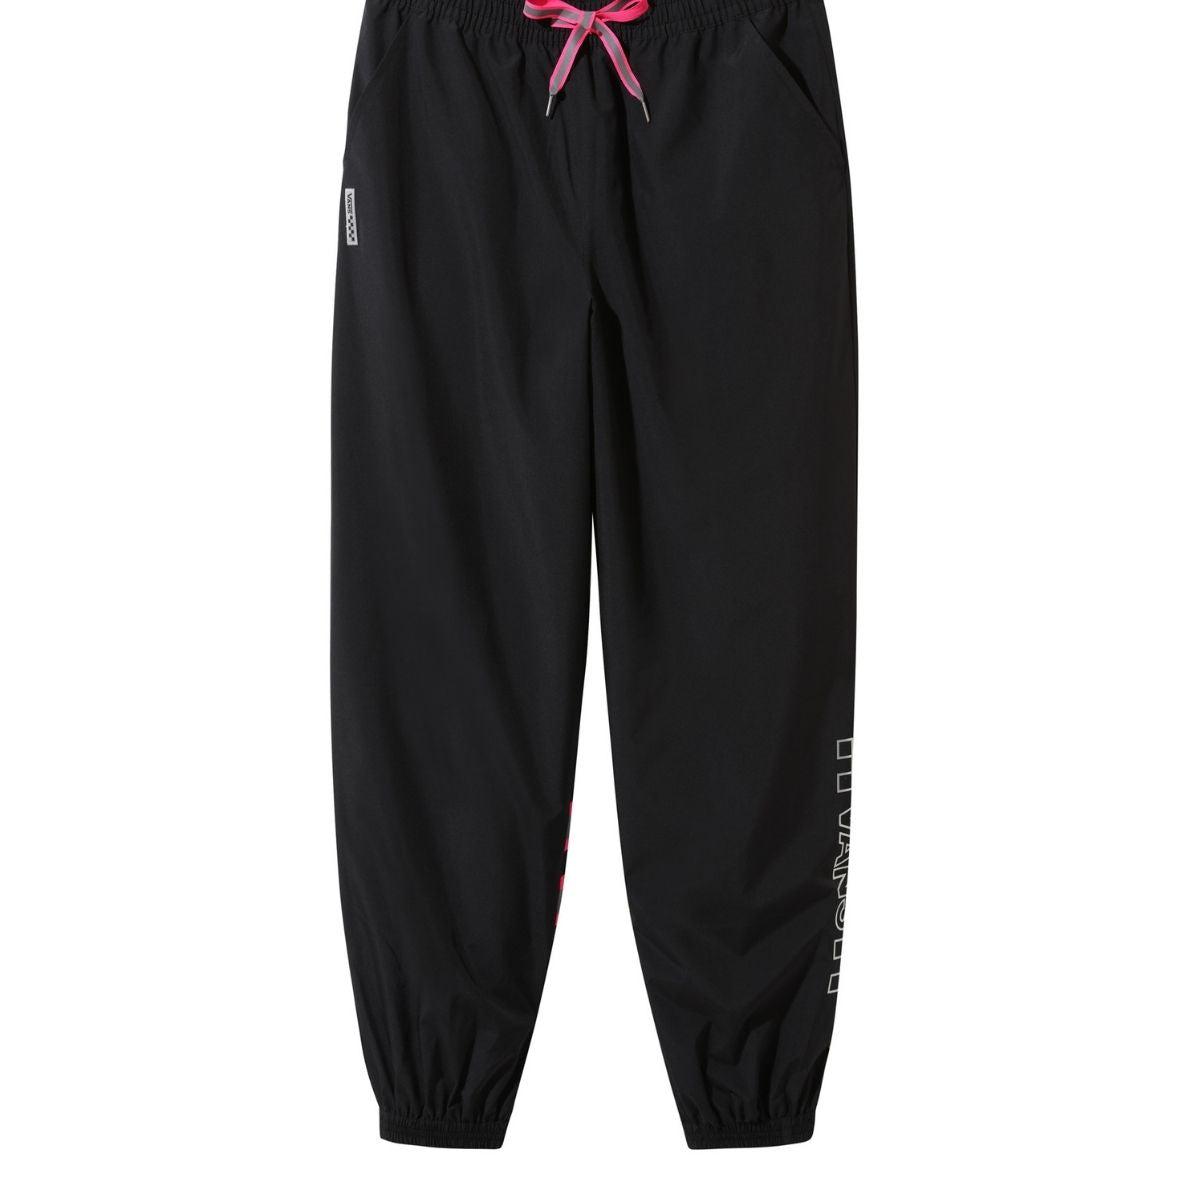 vans pantaloni donna wm after dark pant nero